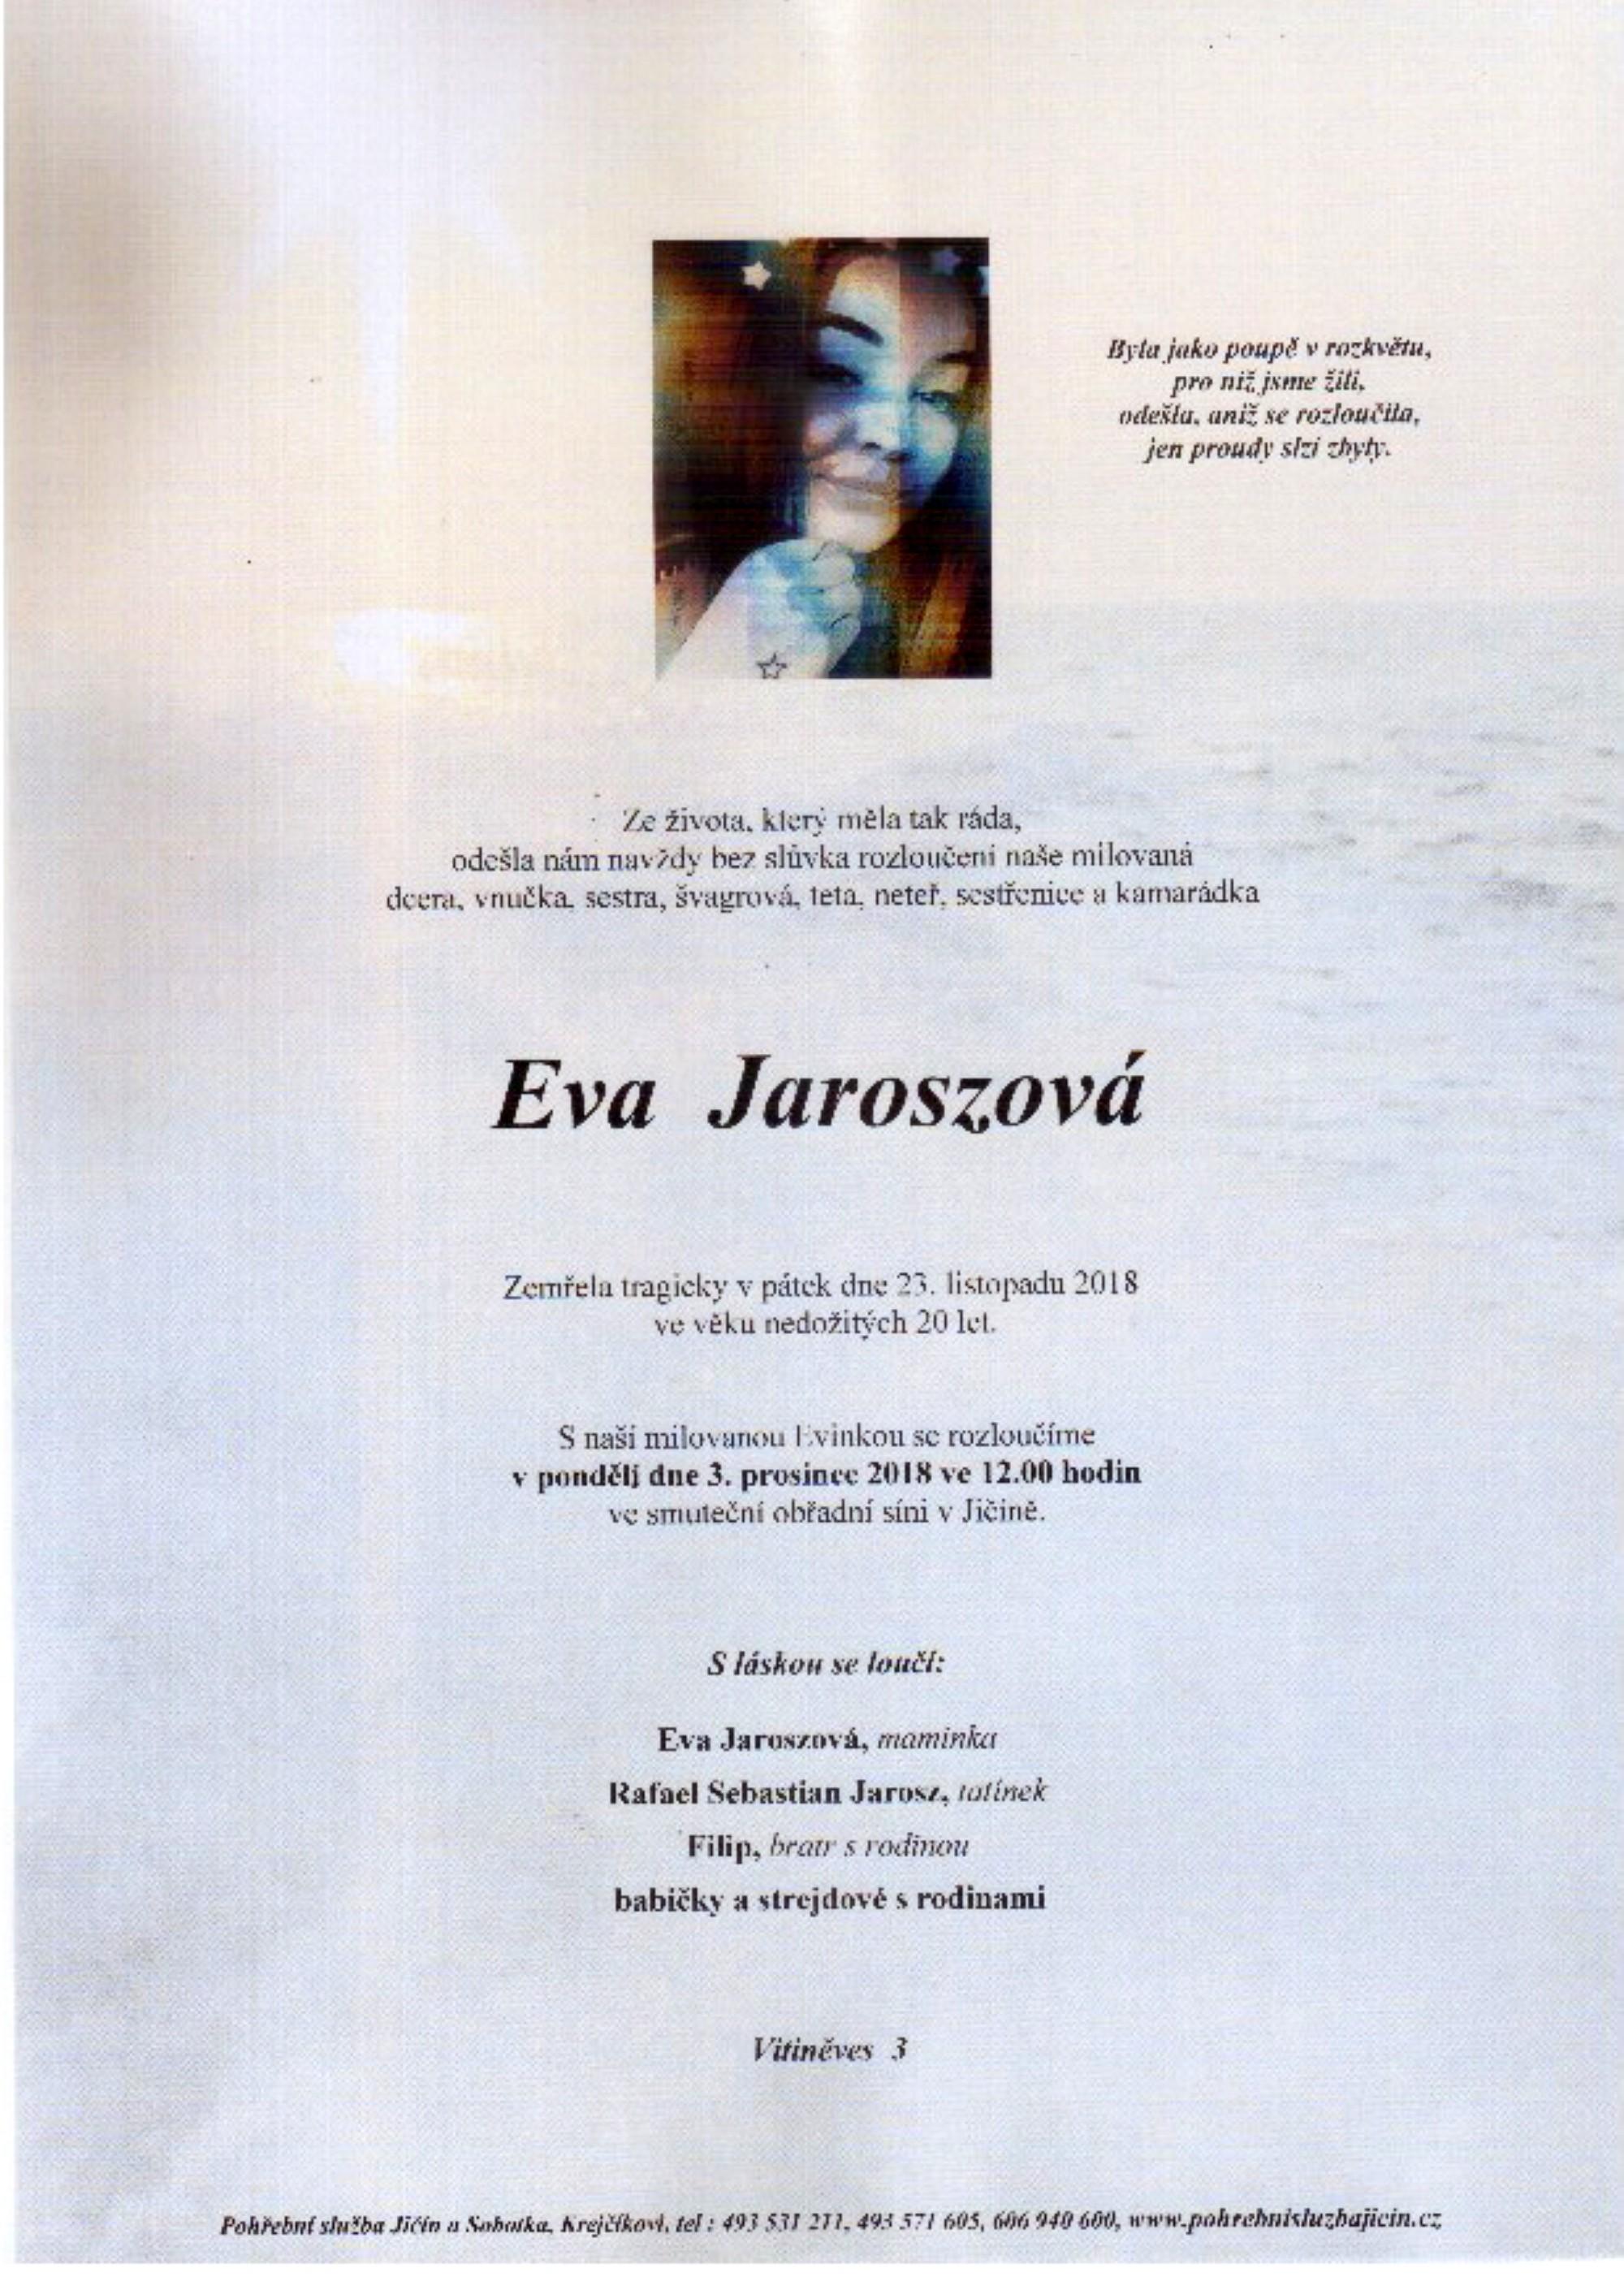 Eva Jaroszová